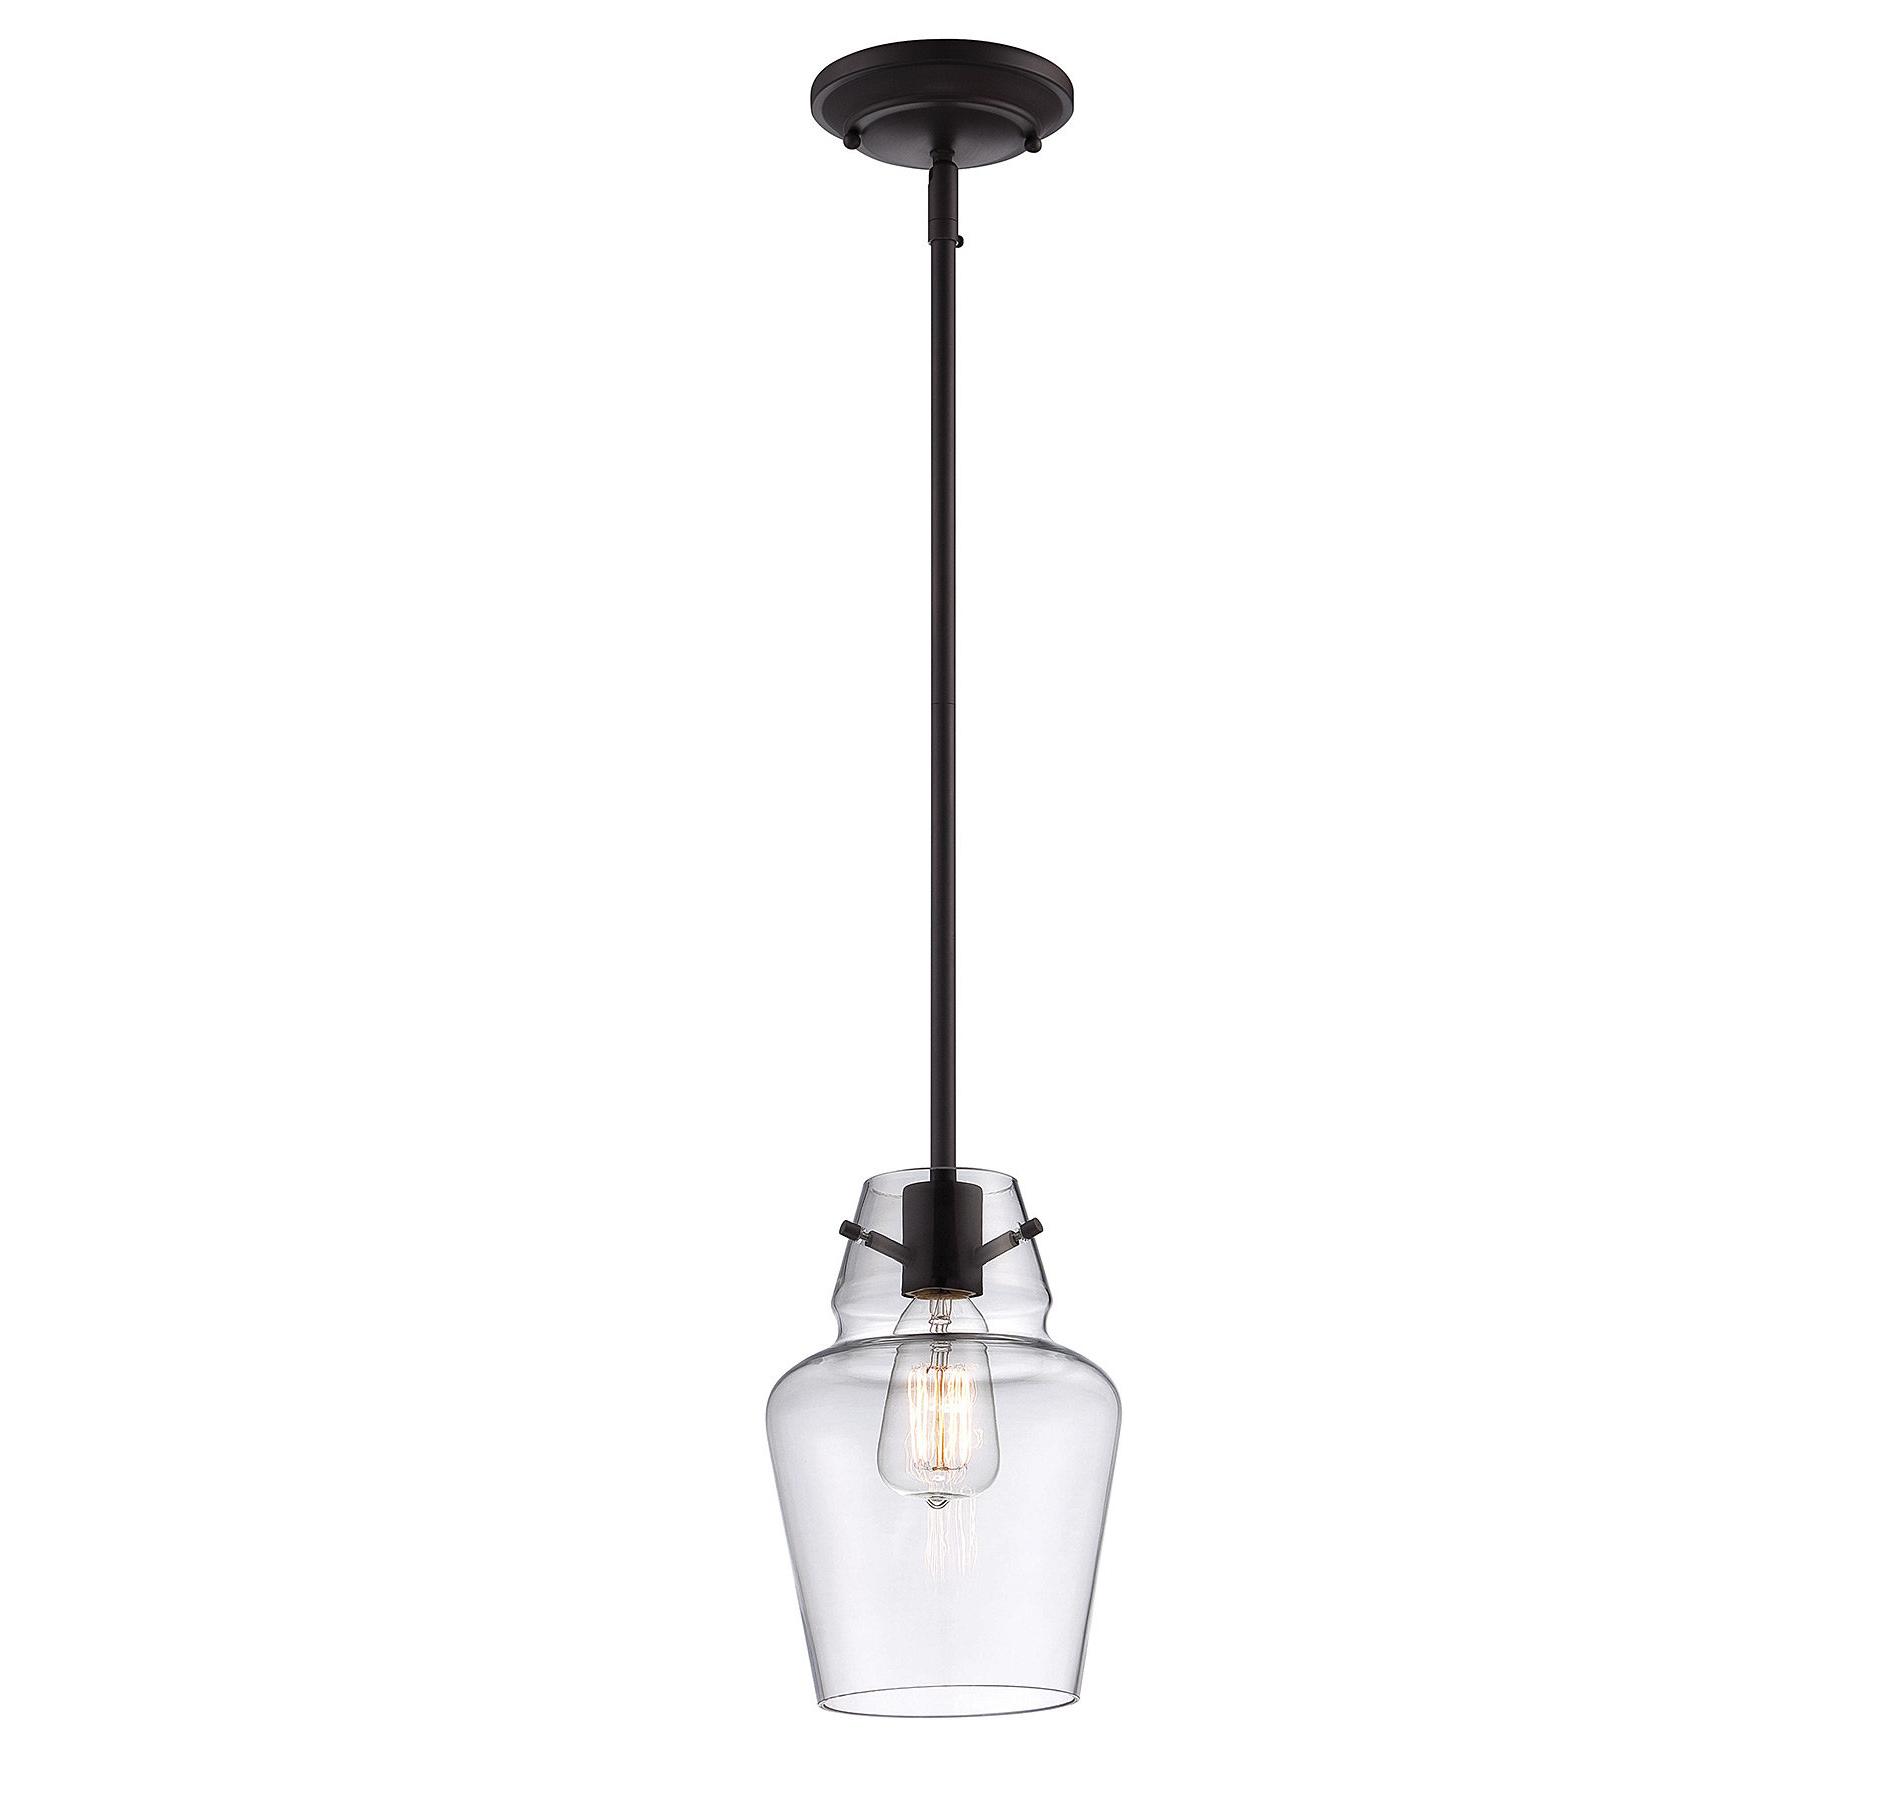 Jayce 1 Light Cylinder Pendants For Most Recent Roslindale 1 Light Bell Pendant (Gallery 16 of 20)